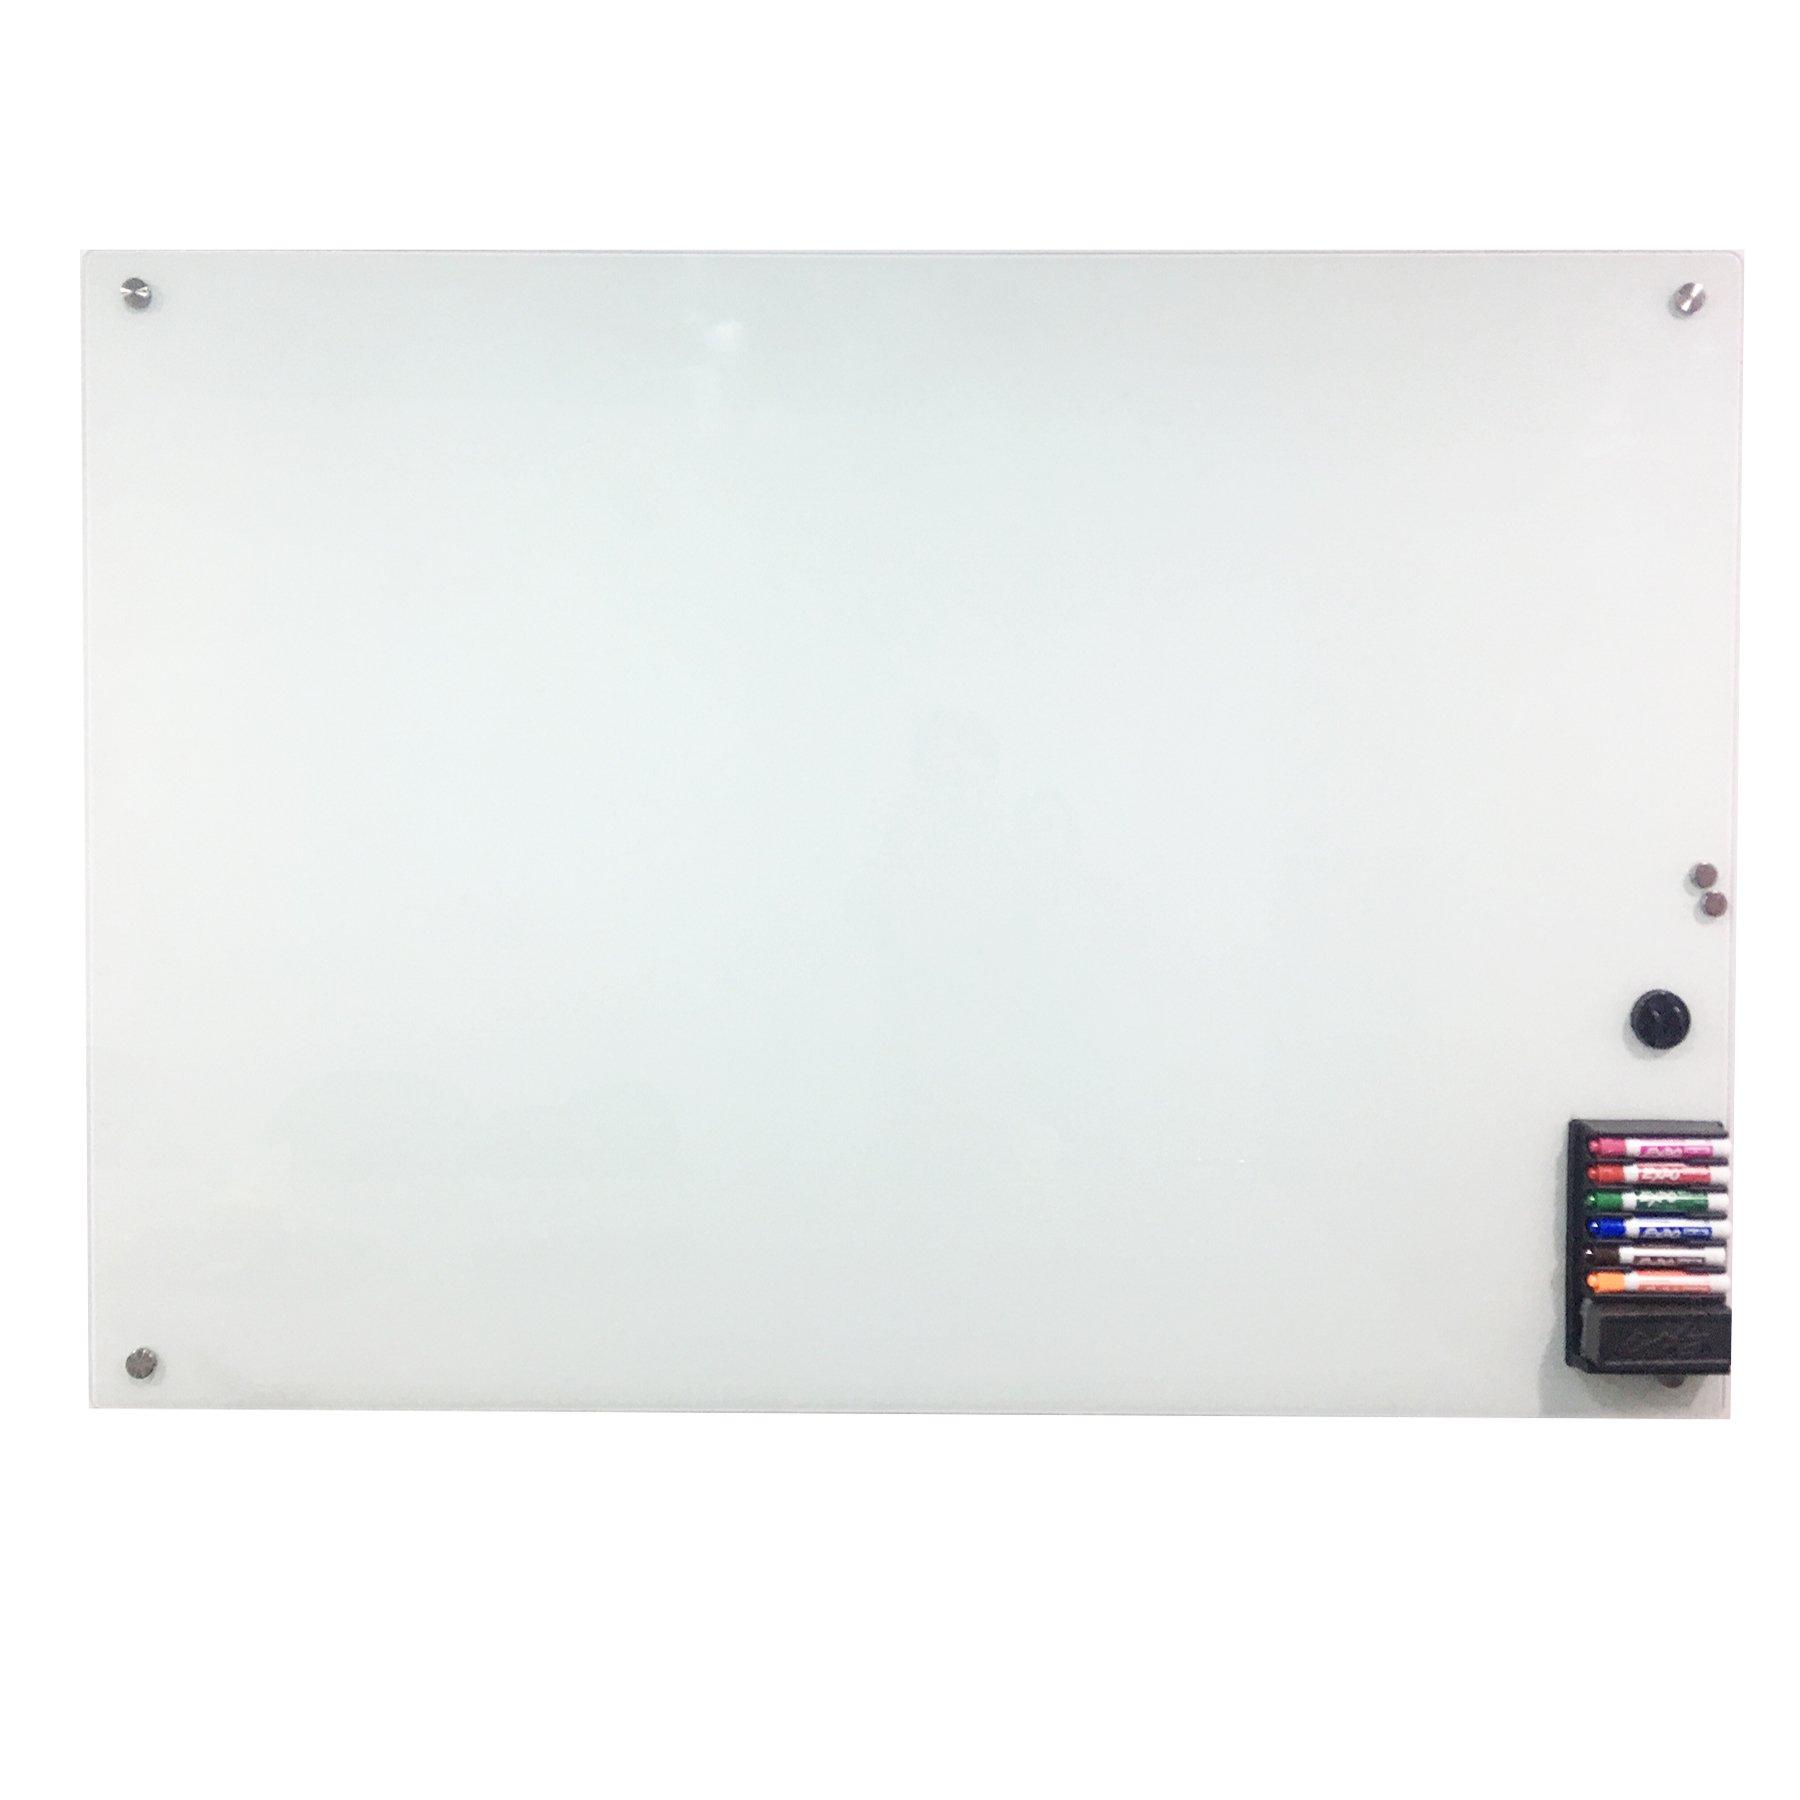 CO-Z Magnetic Glass Dry Erase Board Set , 40''x 60'', Frameless Whiteboard, Includes Board, Maker, Eraser, 2 Magnets